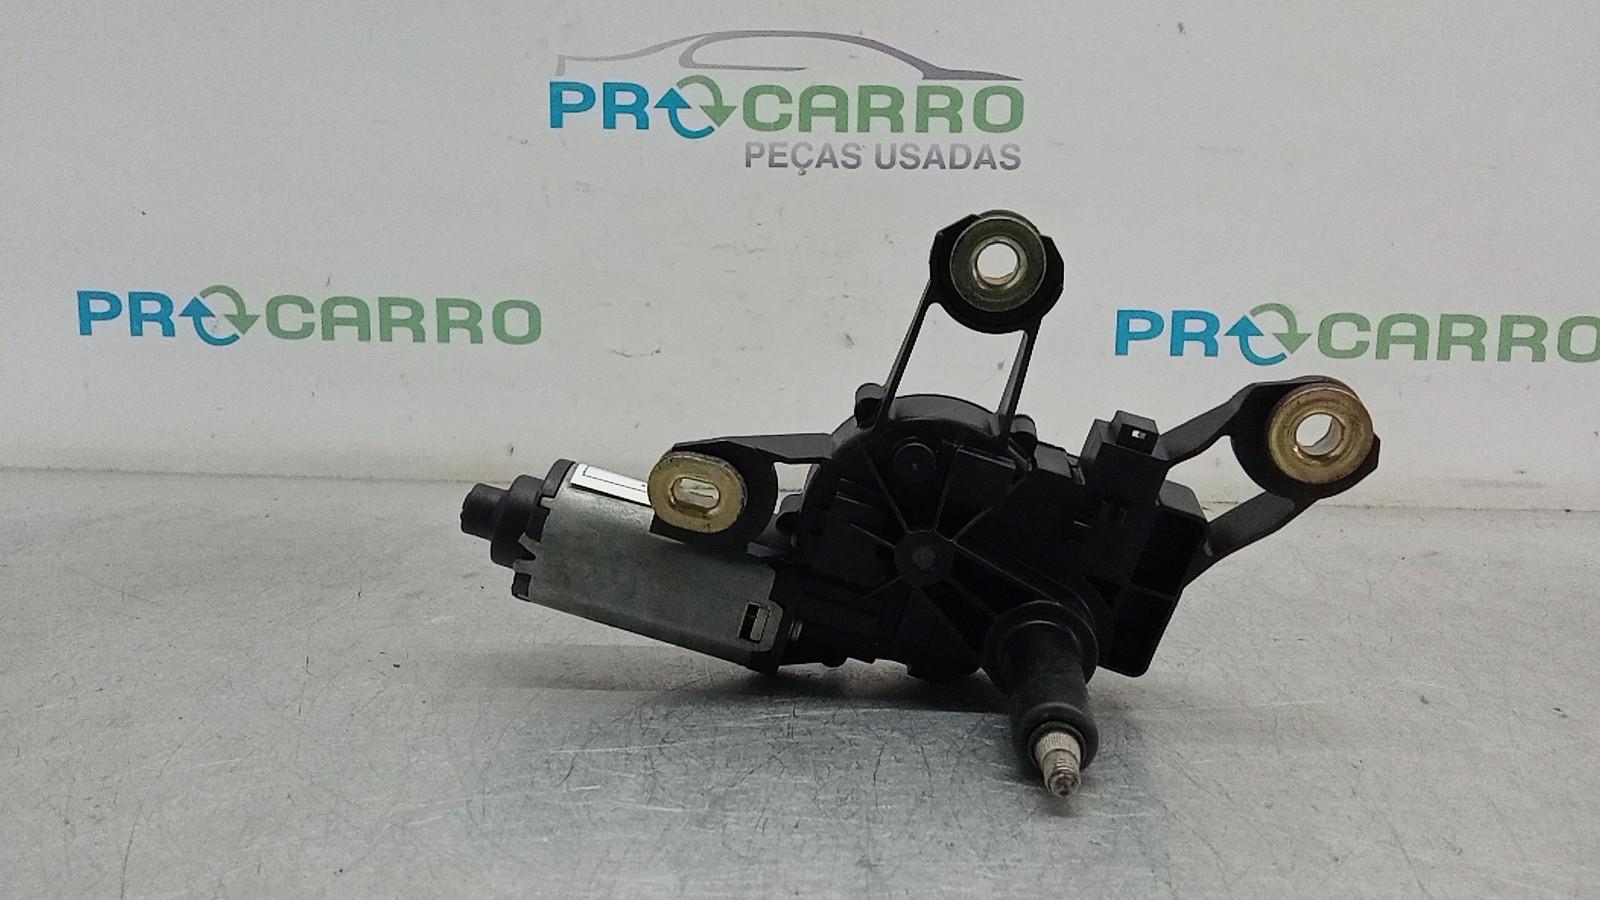 Motor limpa para-brisas Trs (20398901).